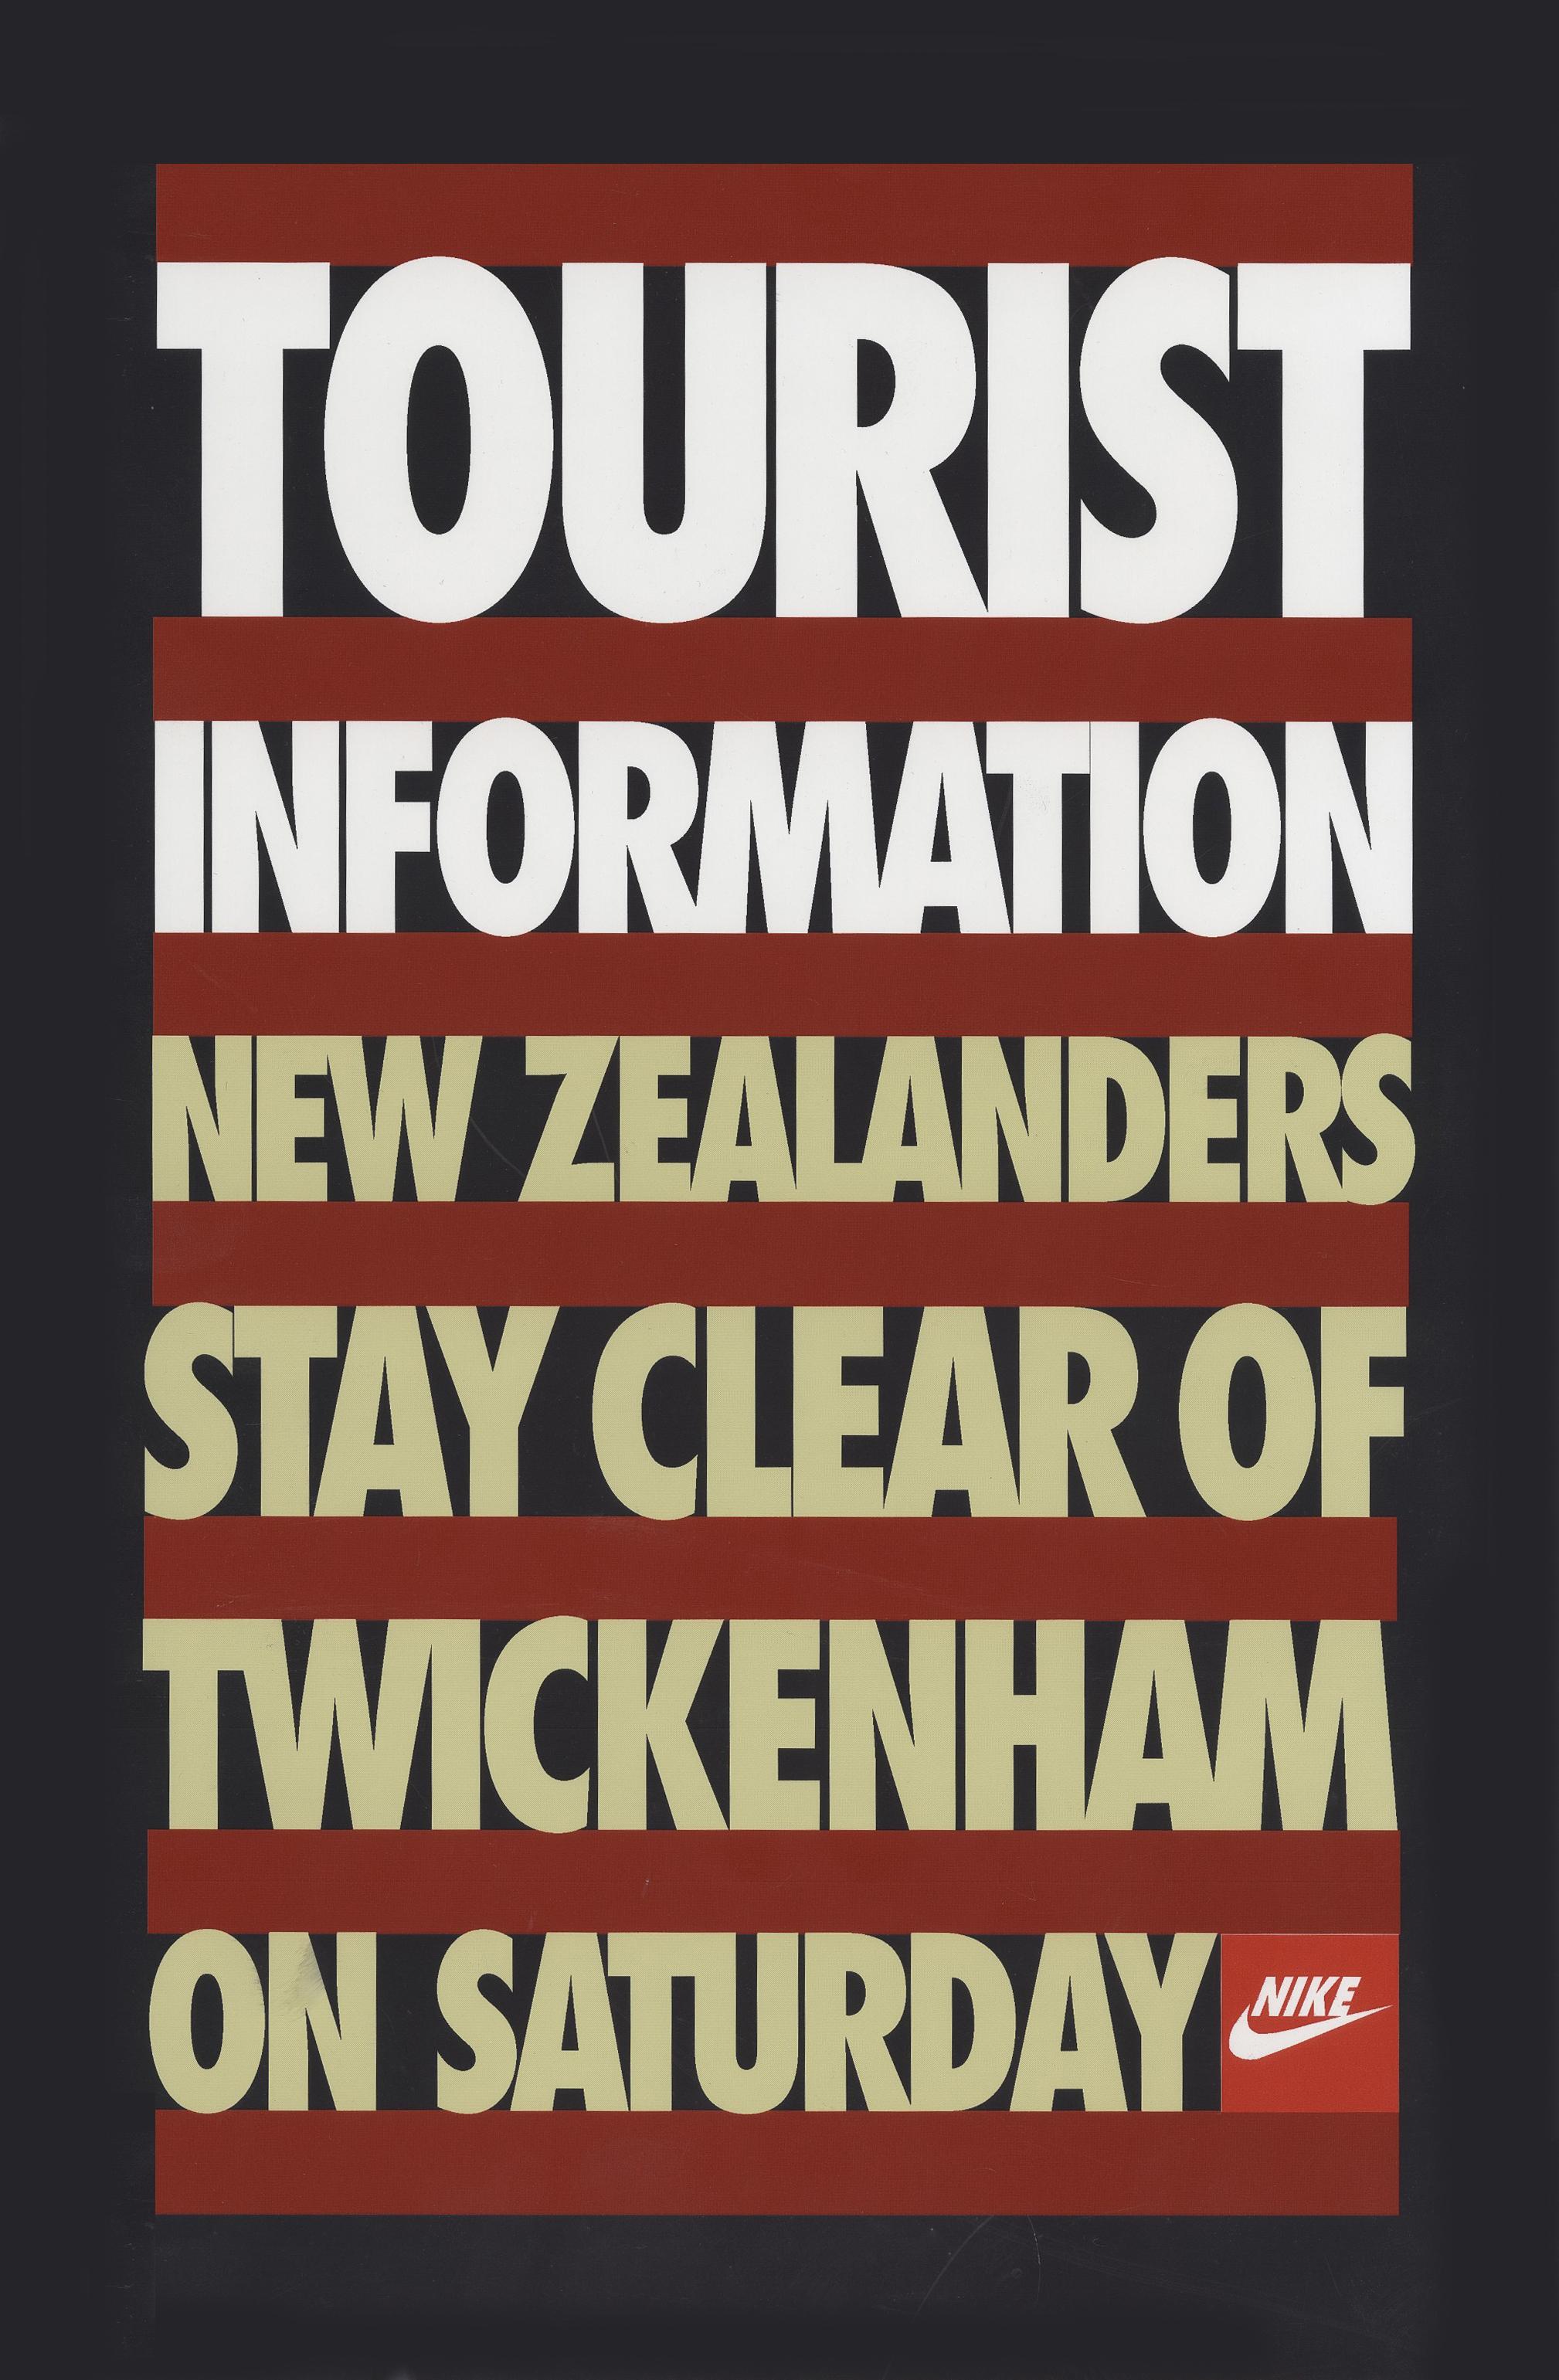 tourist-information-rough-nike-spdcj